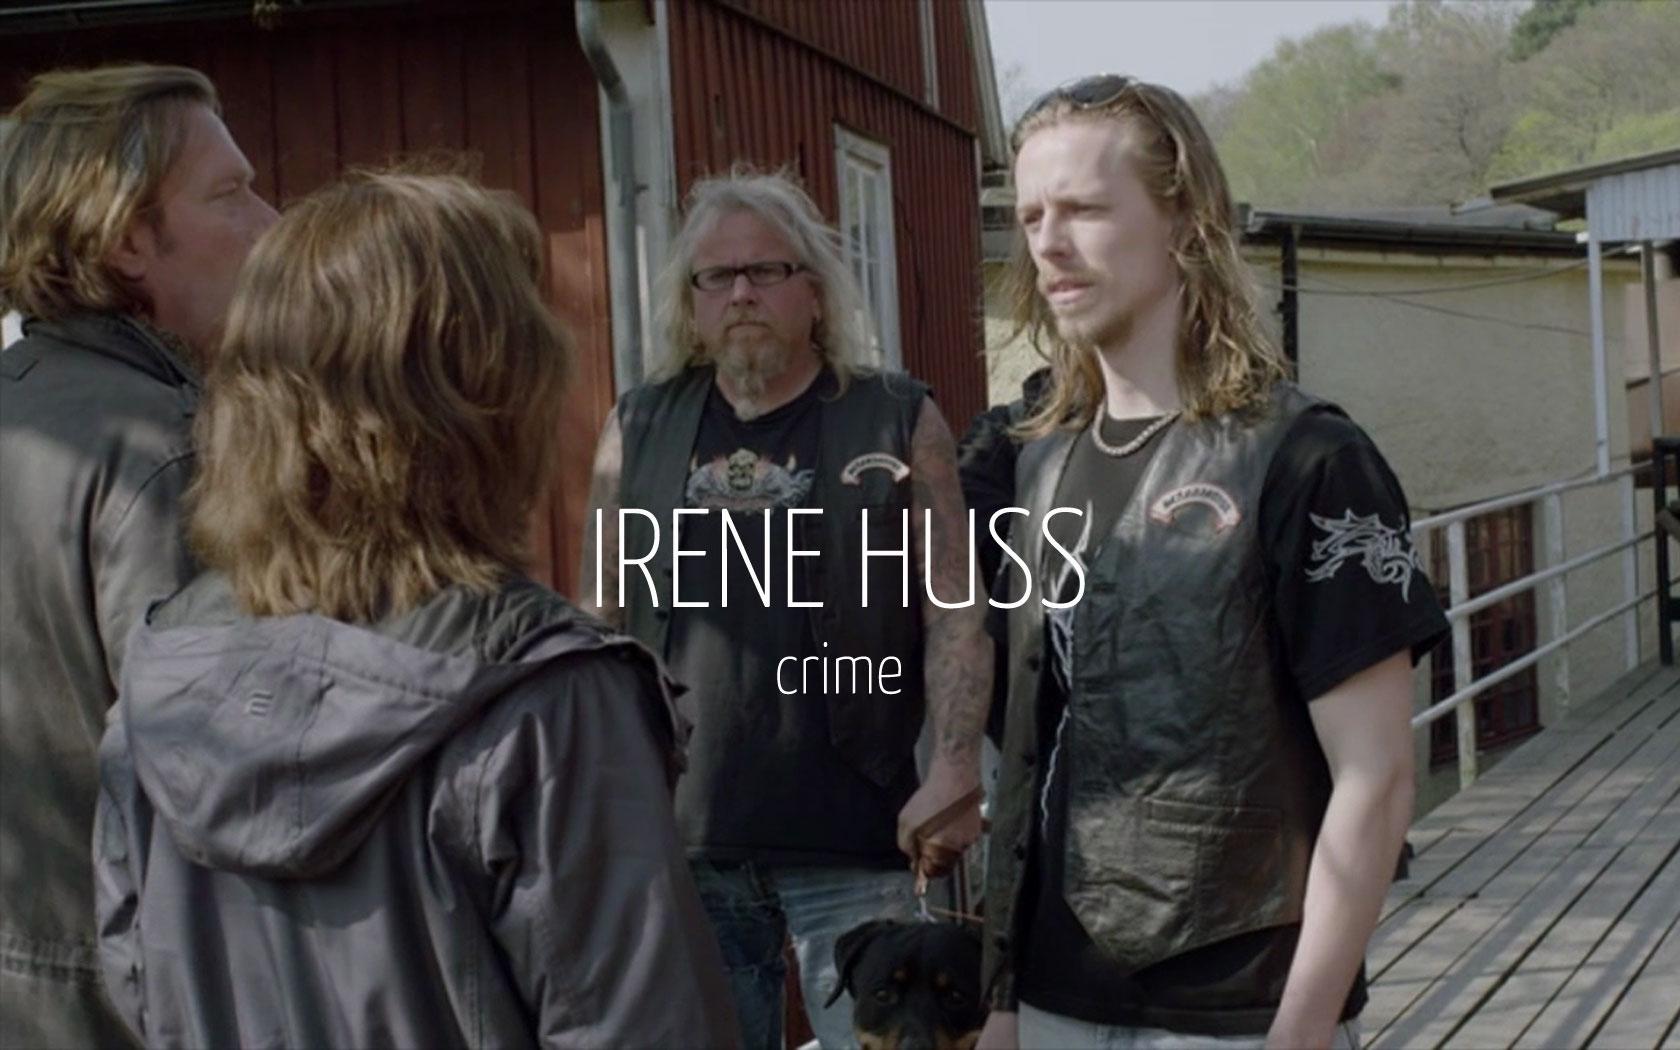 Scandinavian actor Fredrik Wagner as biker in criminal drama film Irene Huss with Dag Malmberg